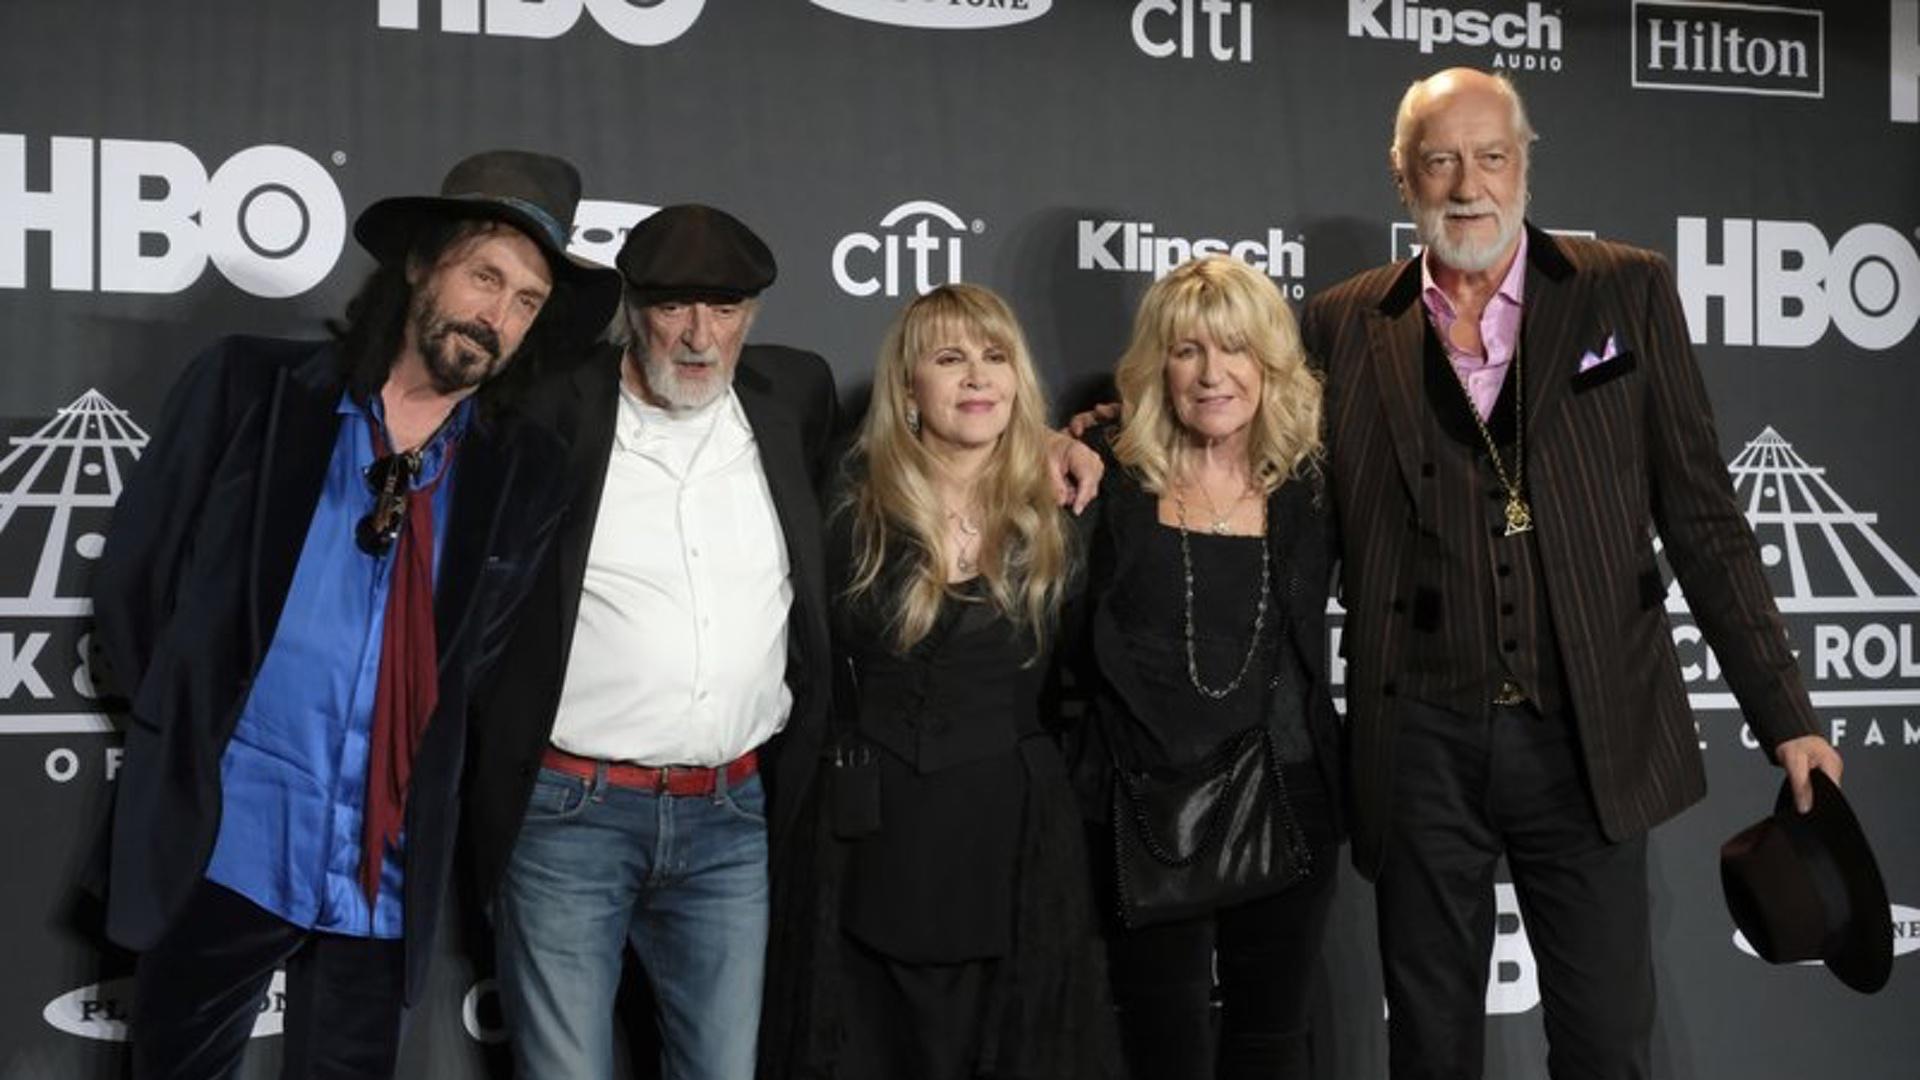 Fleetwood Mac Announces Rescheduled Dates for Tour